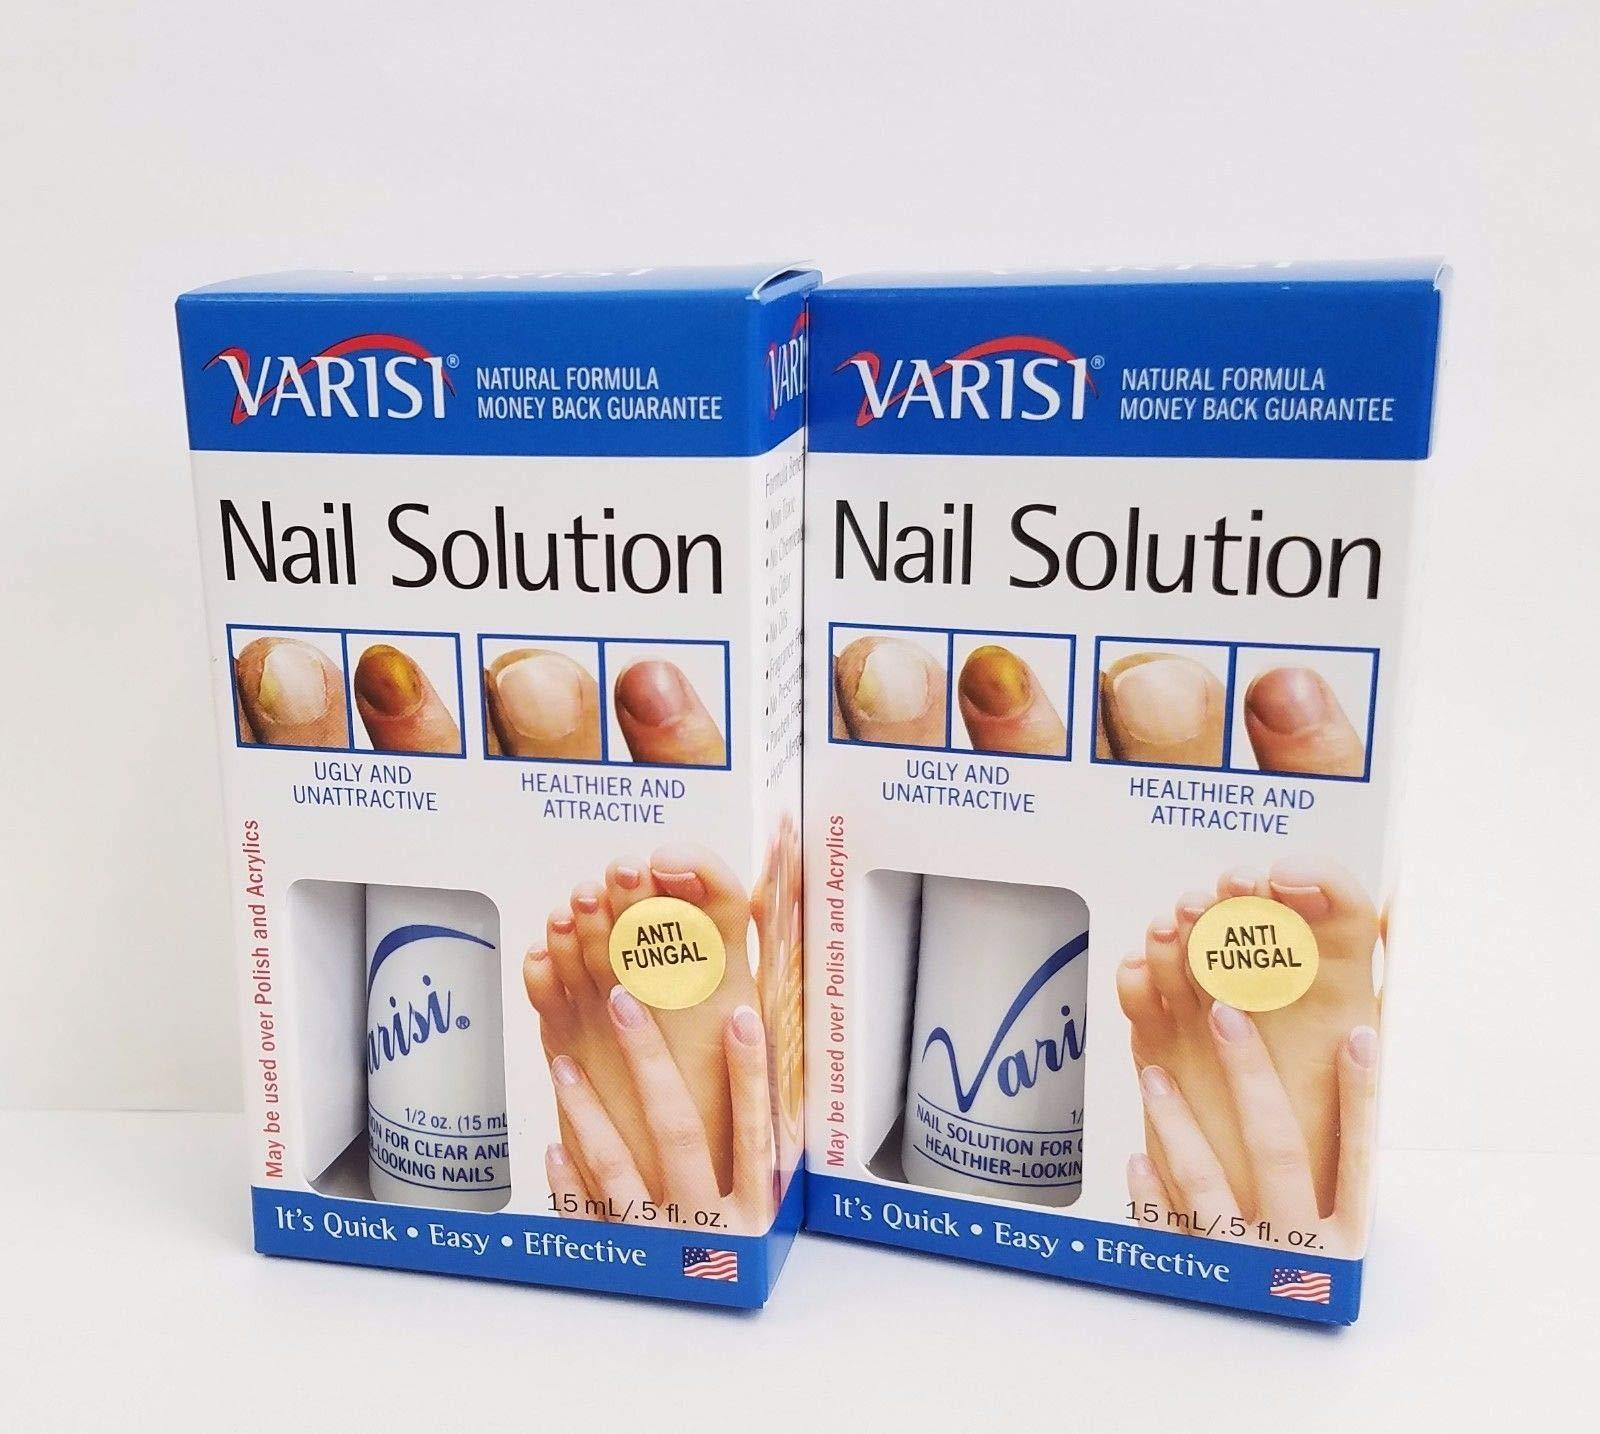 Varisi Nail Restore 0.5 oz (Pack of 2)